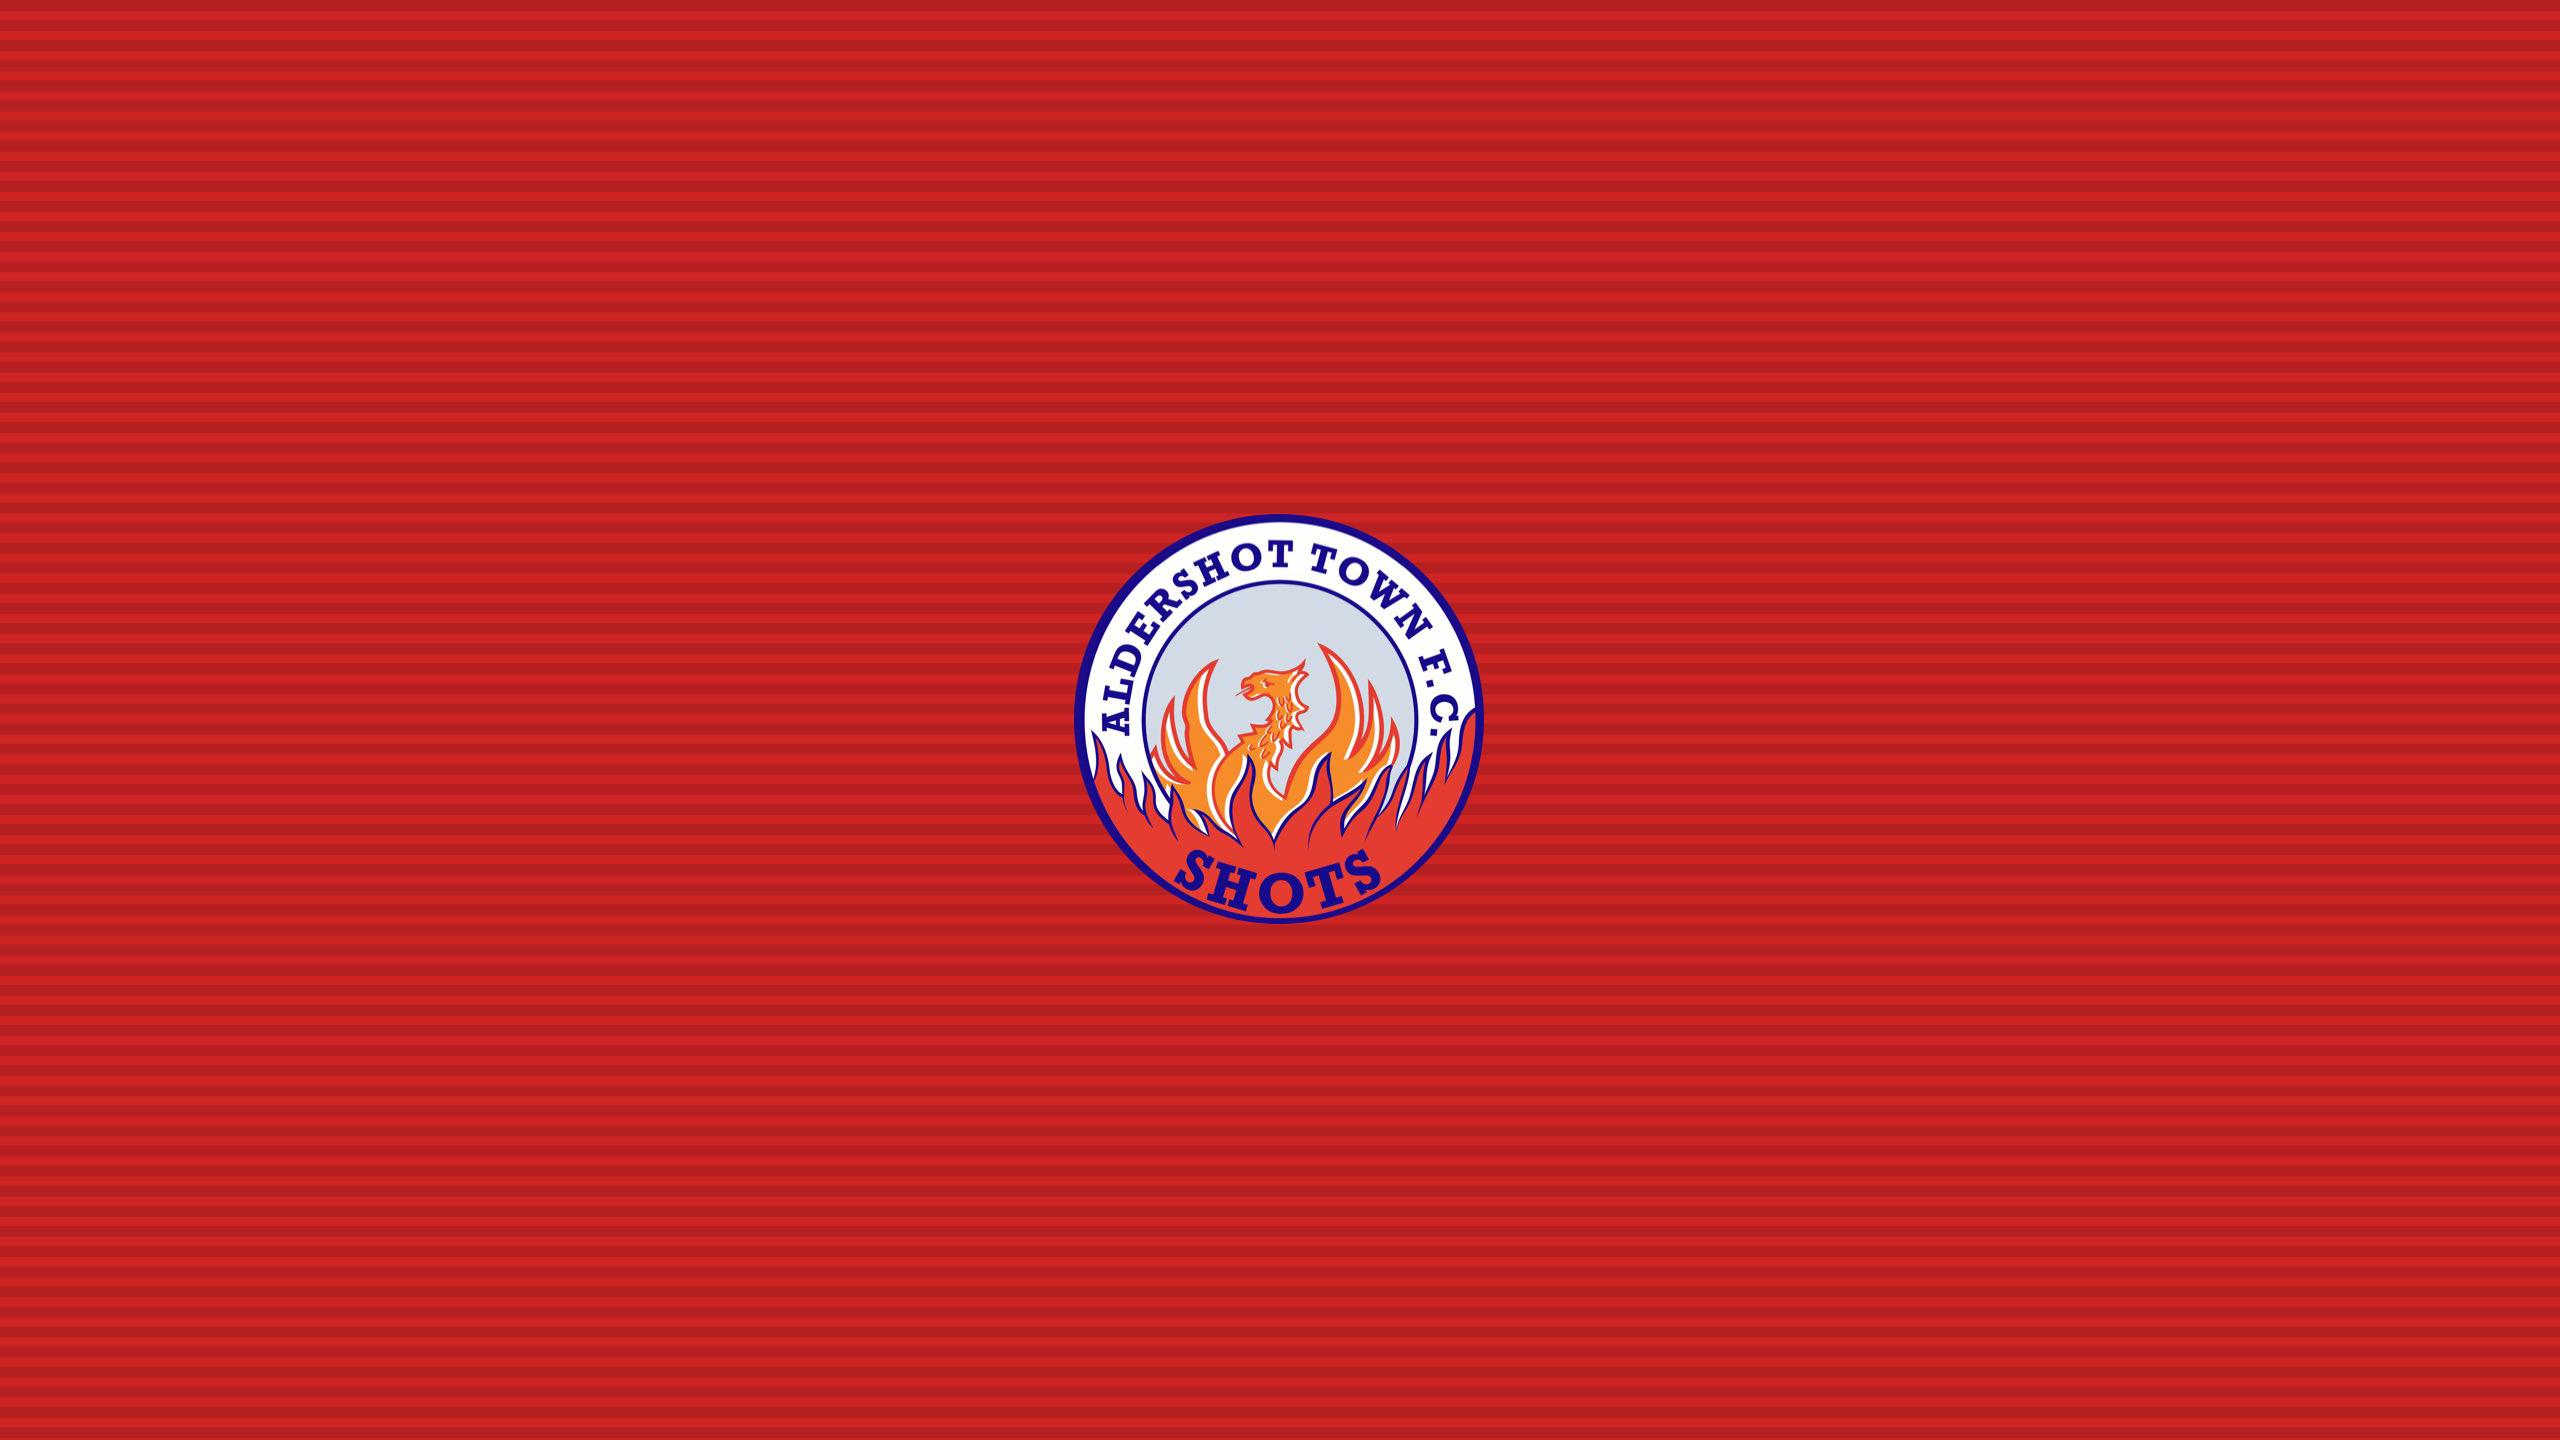 Aldershot Town FC